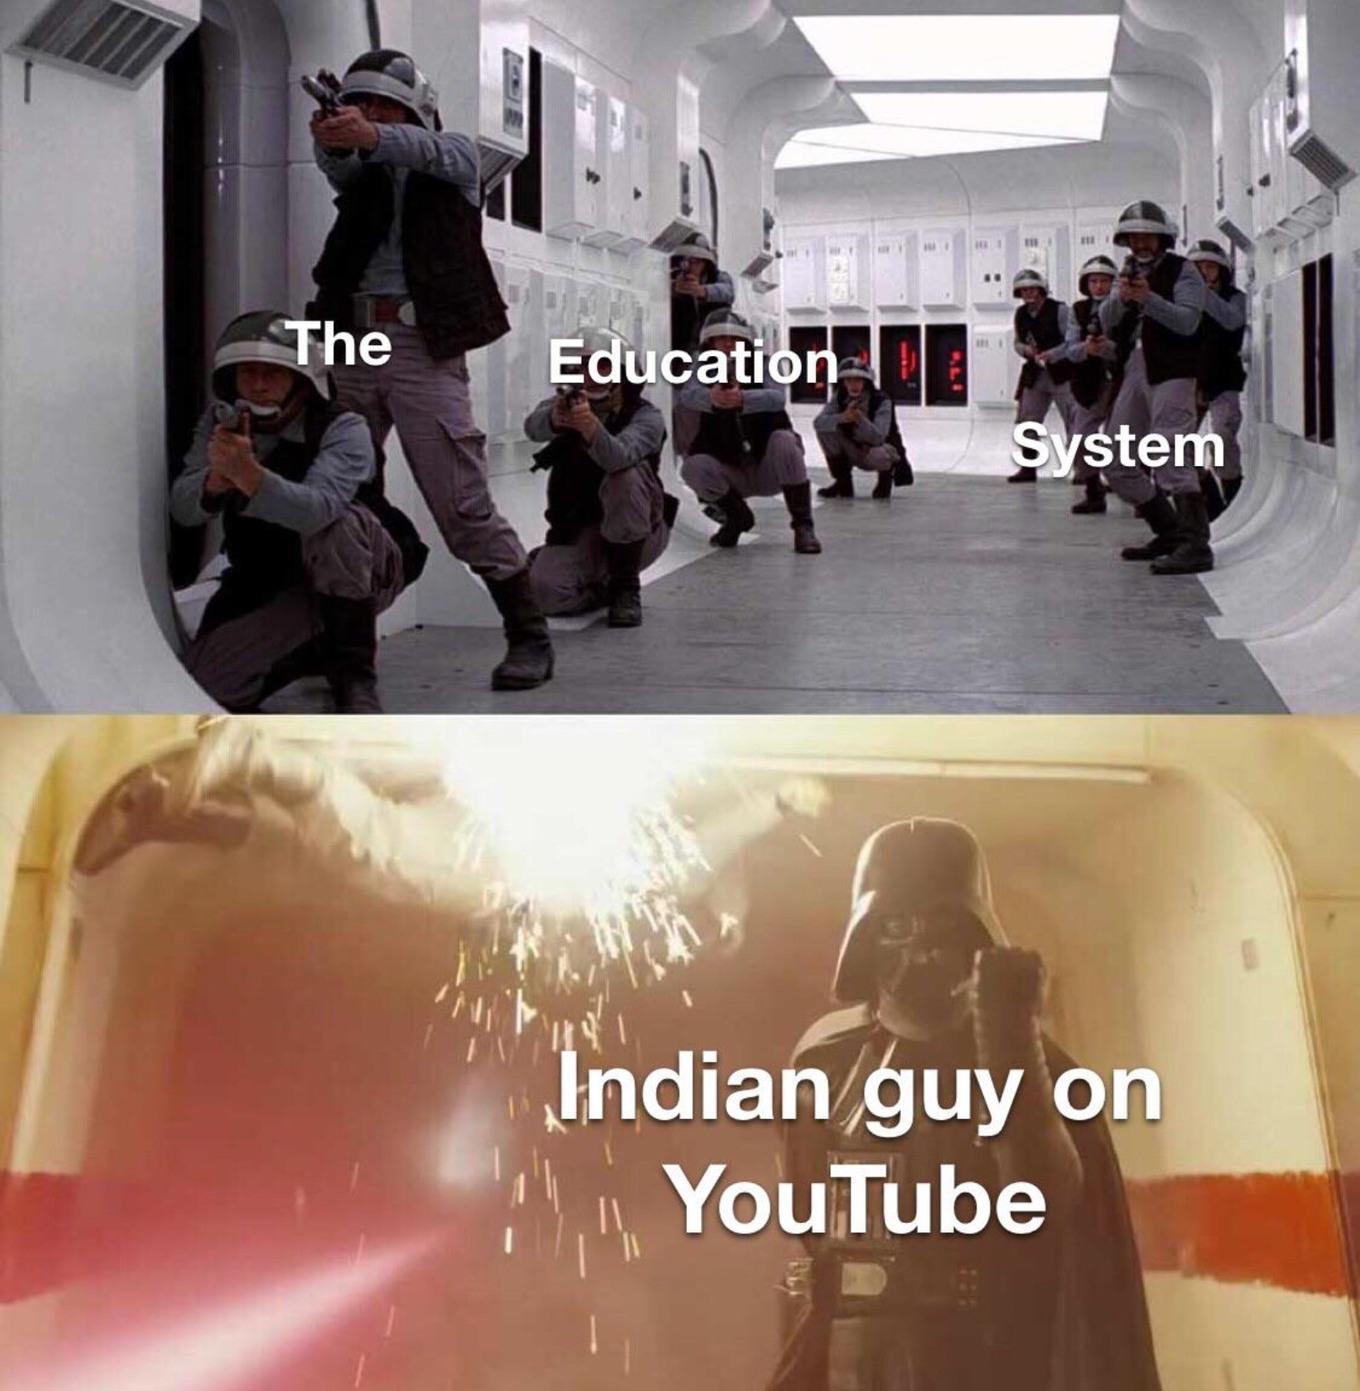 They are my saviors - meme